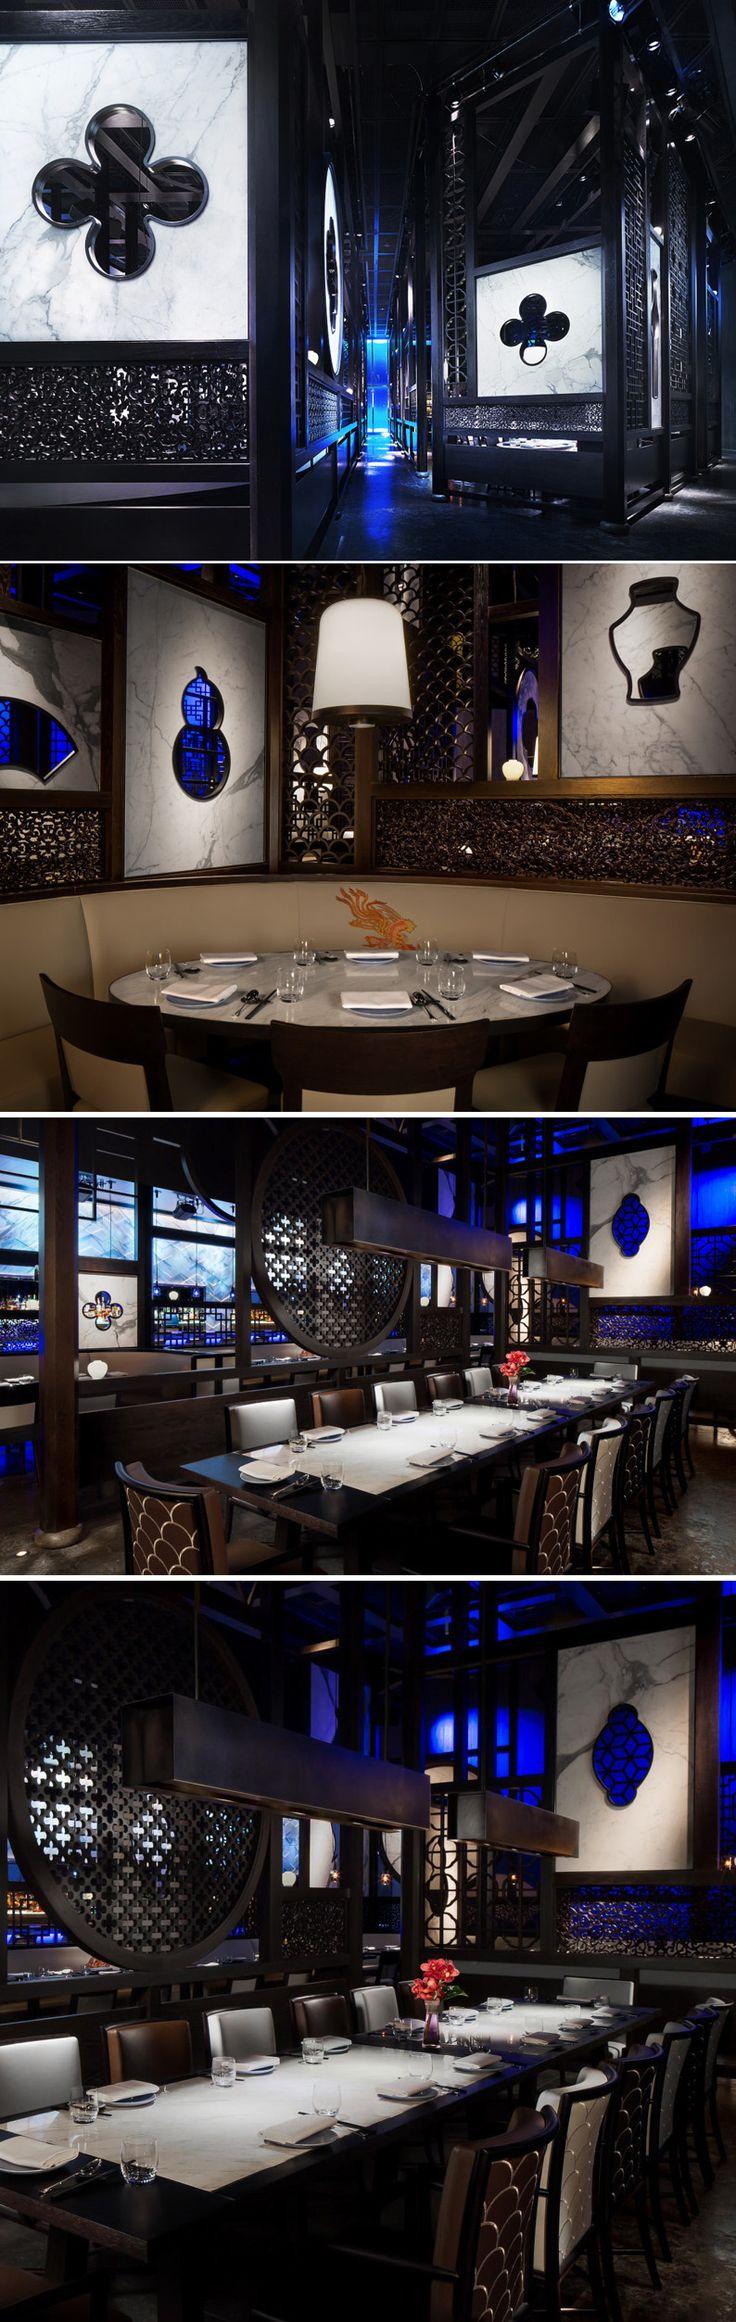 Hakkasan Las Vegas Restaurant and Nightclub_Gilles et Boissier